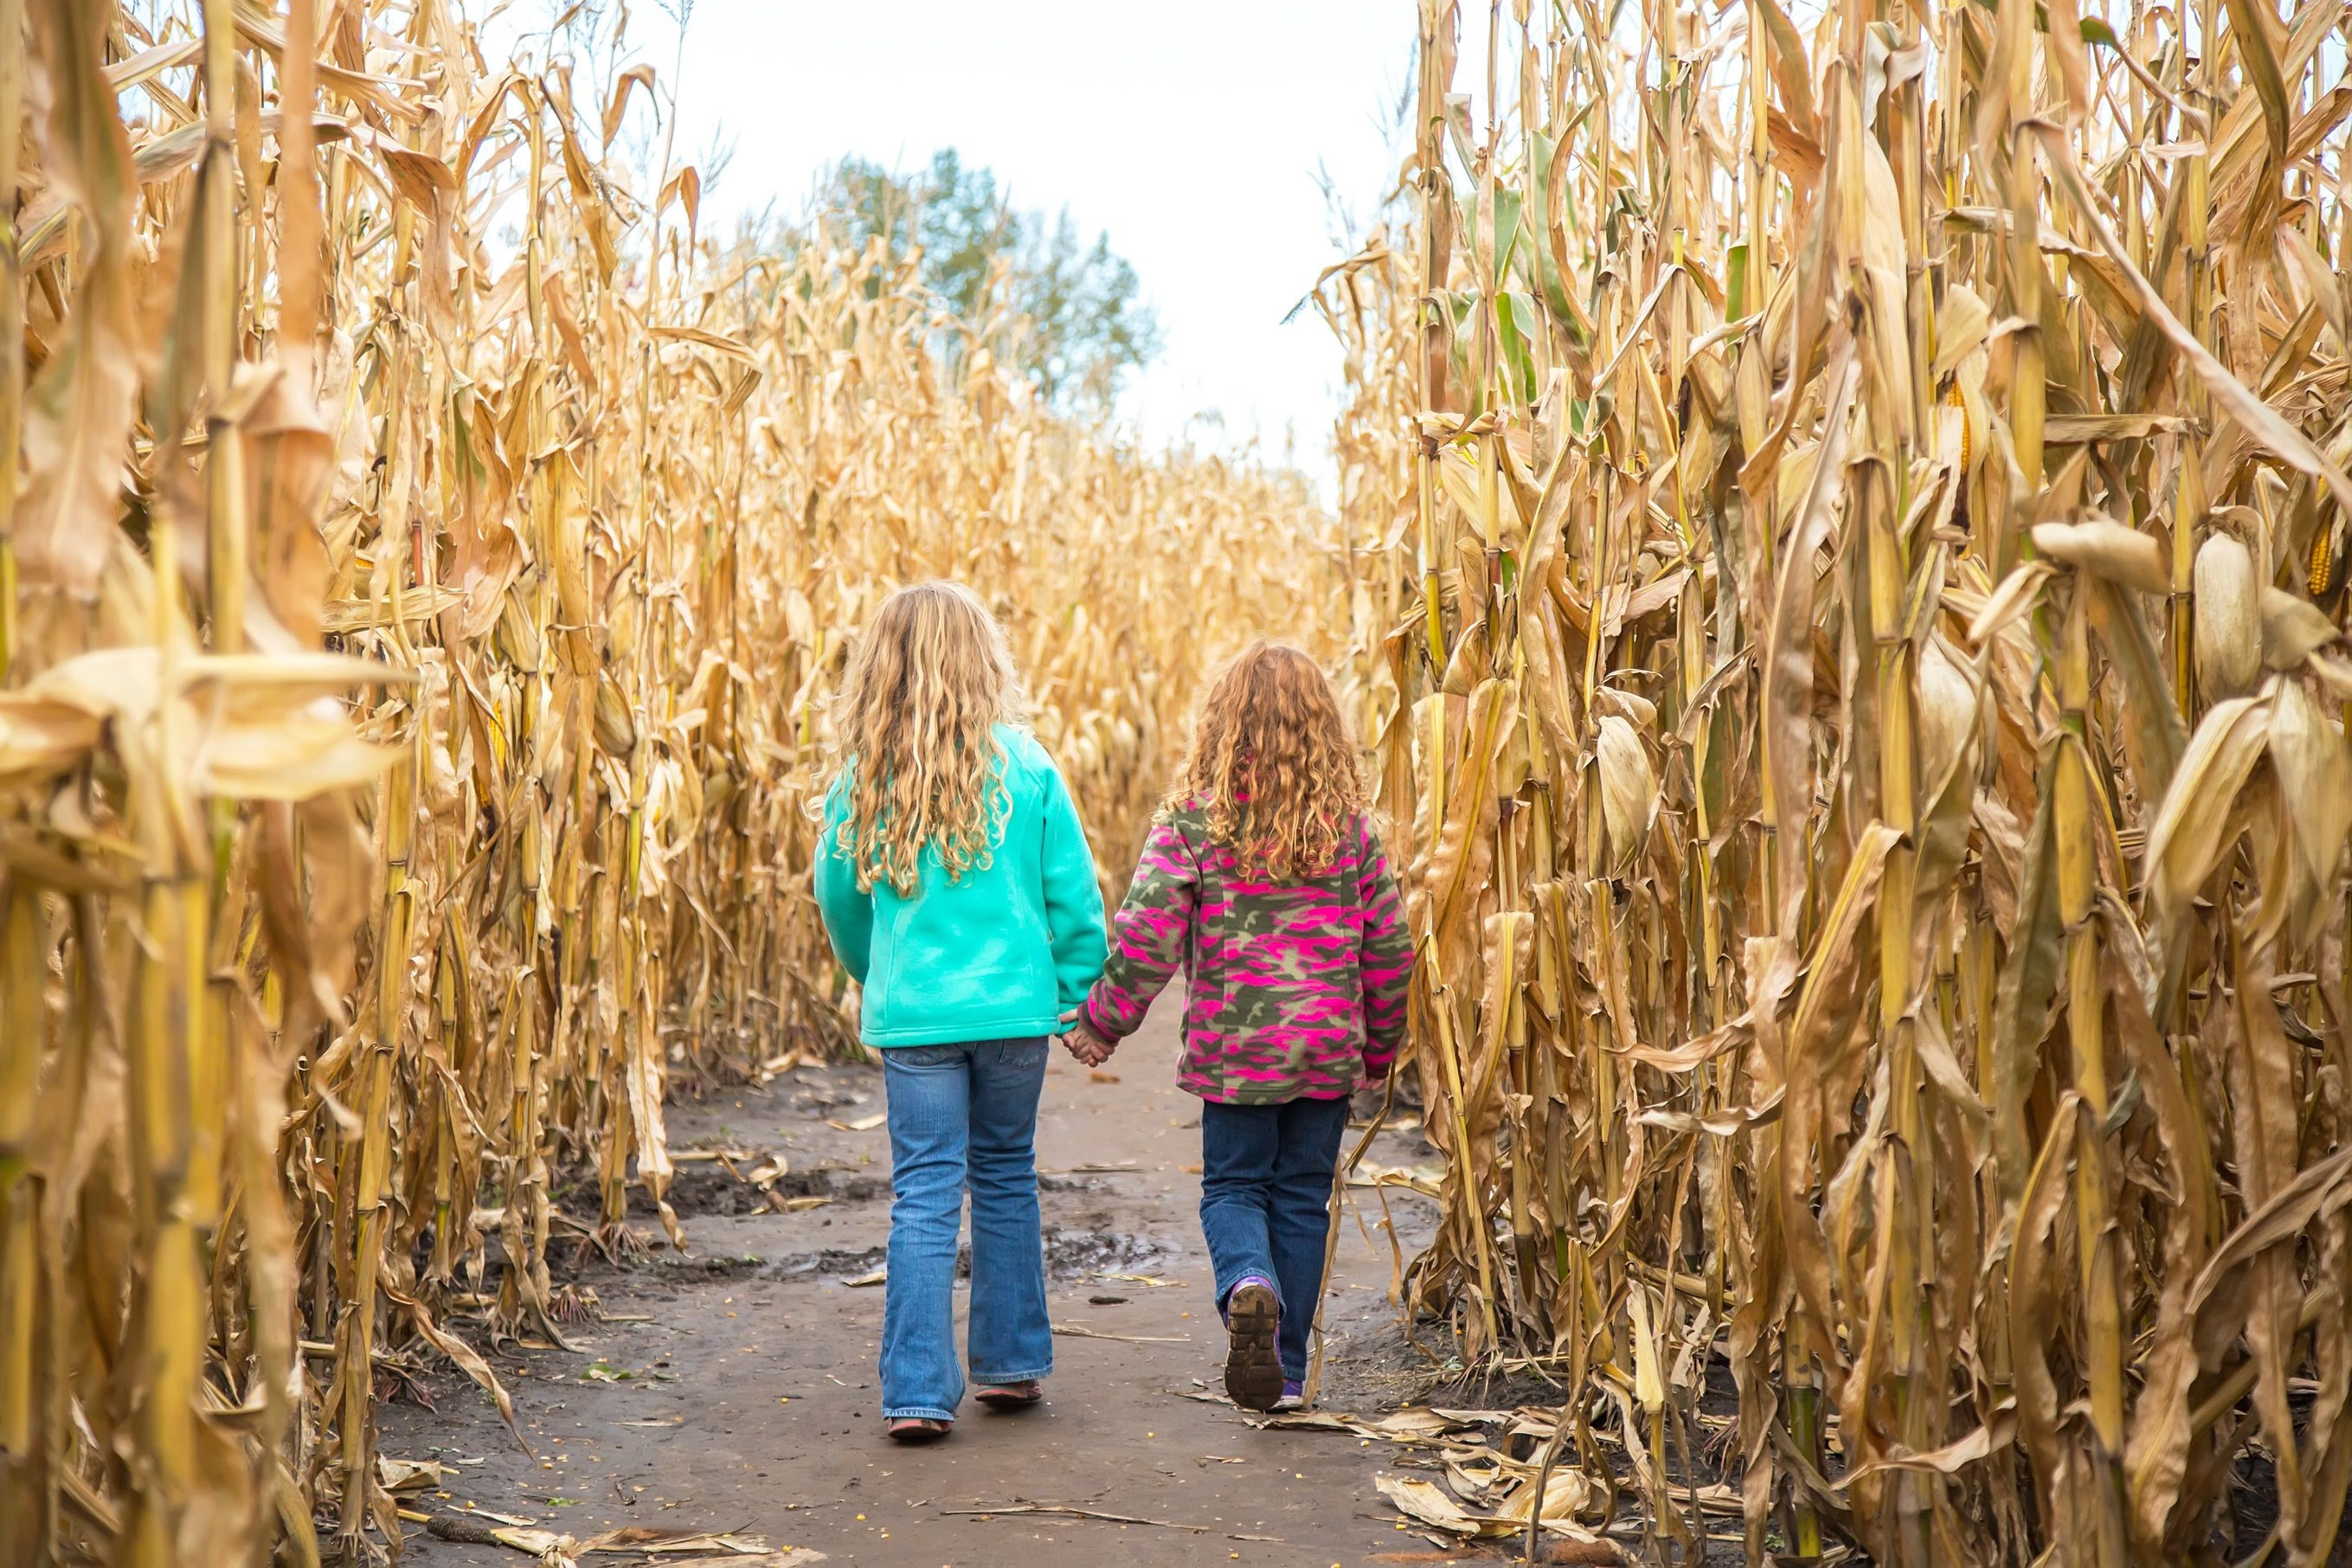 Corn Maze Large Scale Art Camp